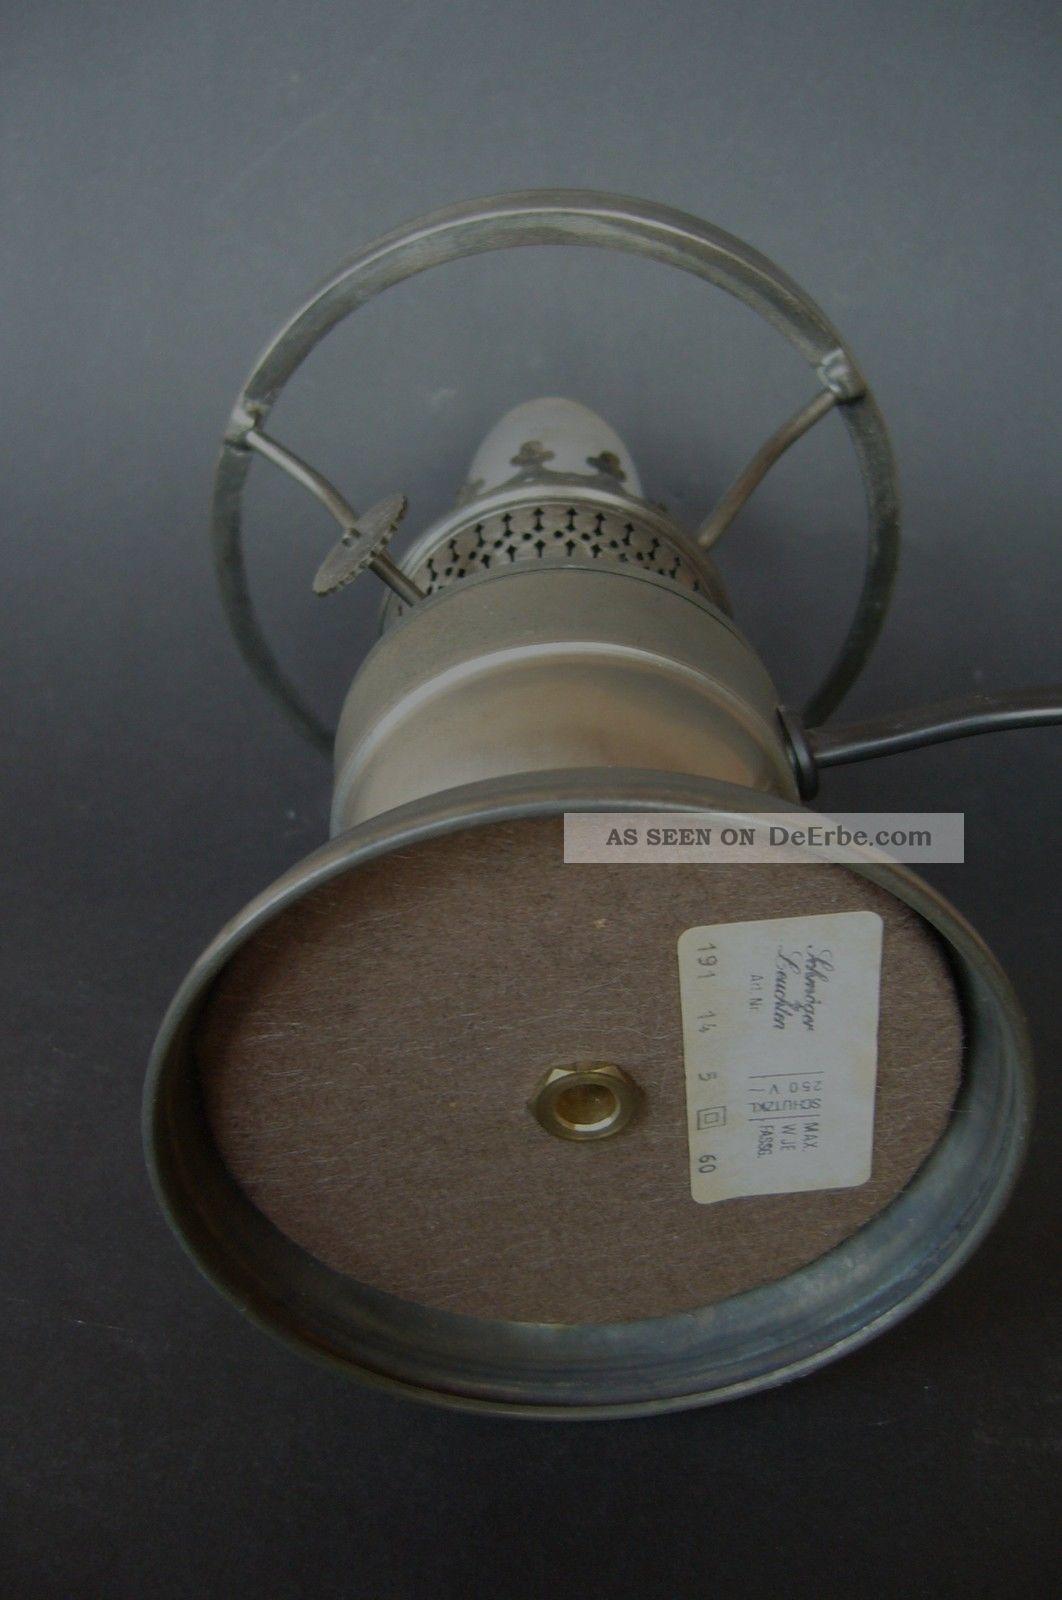 petroleumlampe zinnlampe tischlampe glaszylinder gr ner lampenschirm elektrisch. Black Bedroom Furniture Sets. Home Design Ideas